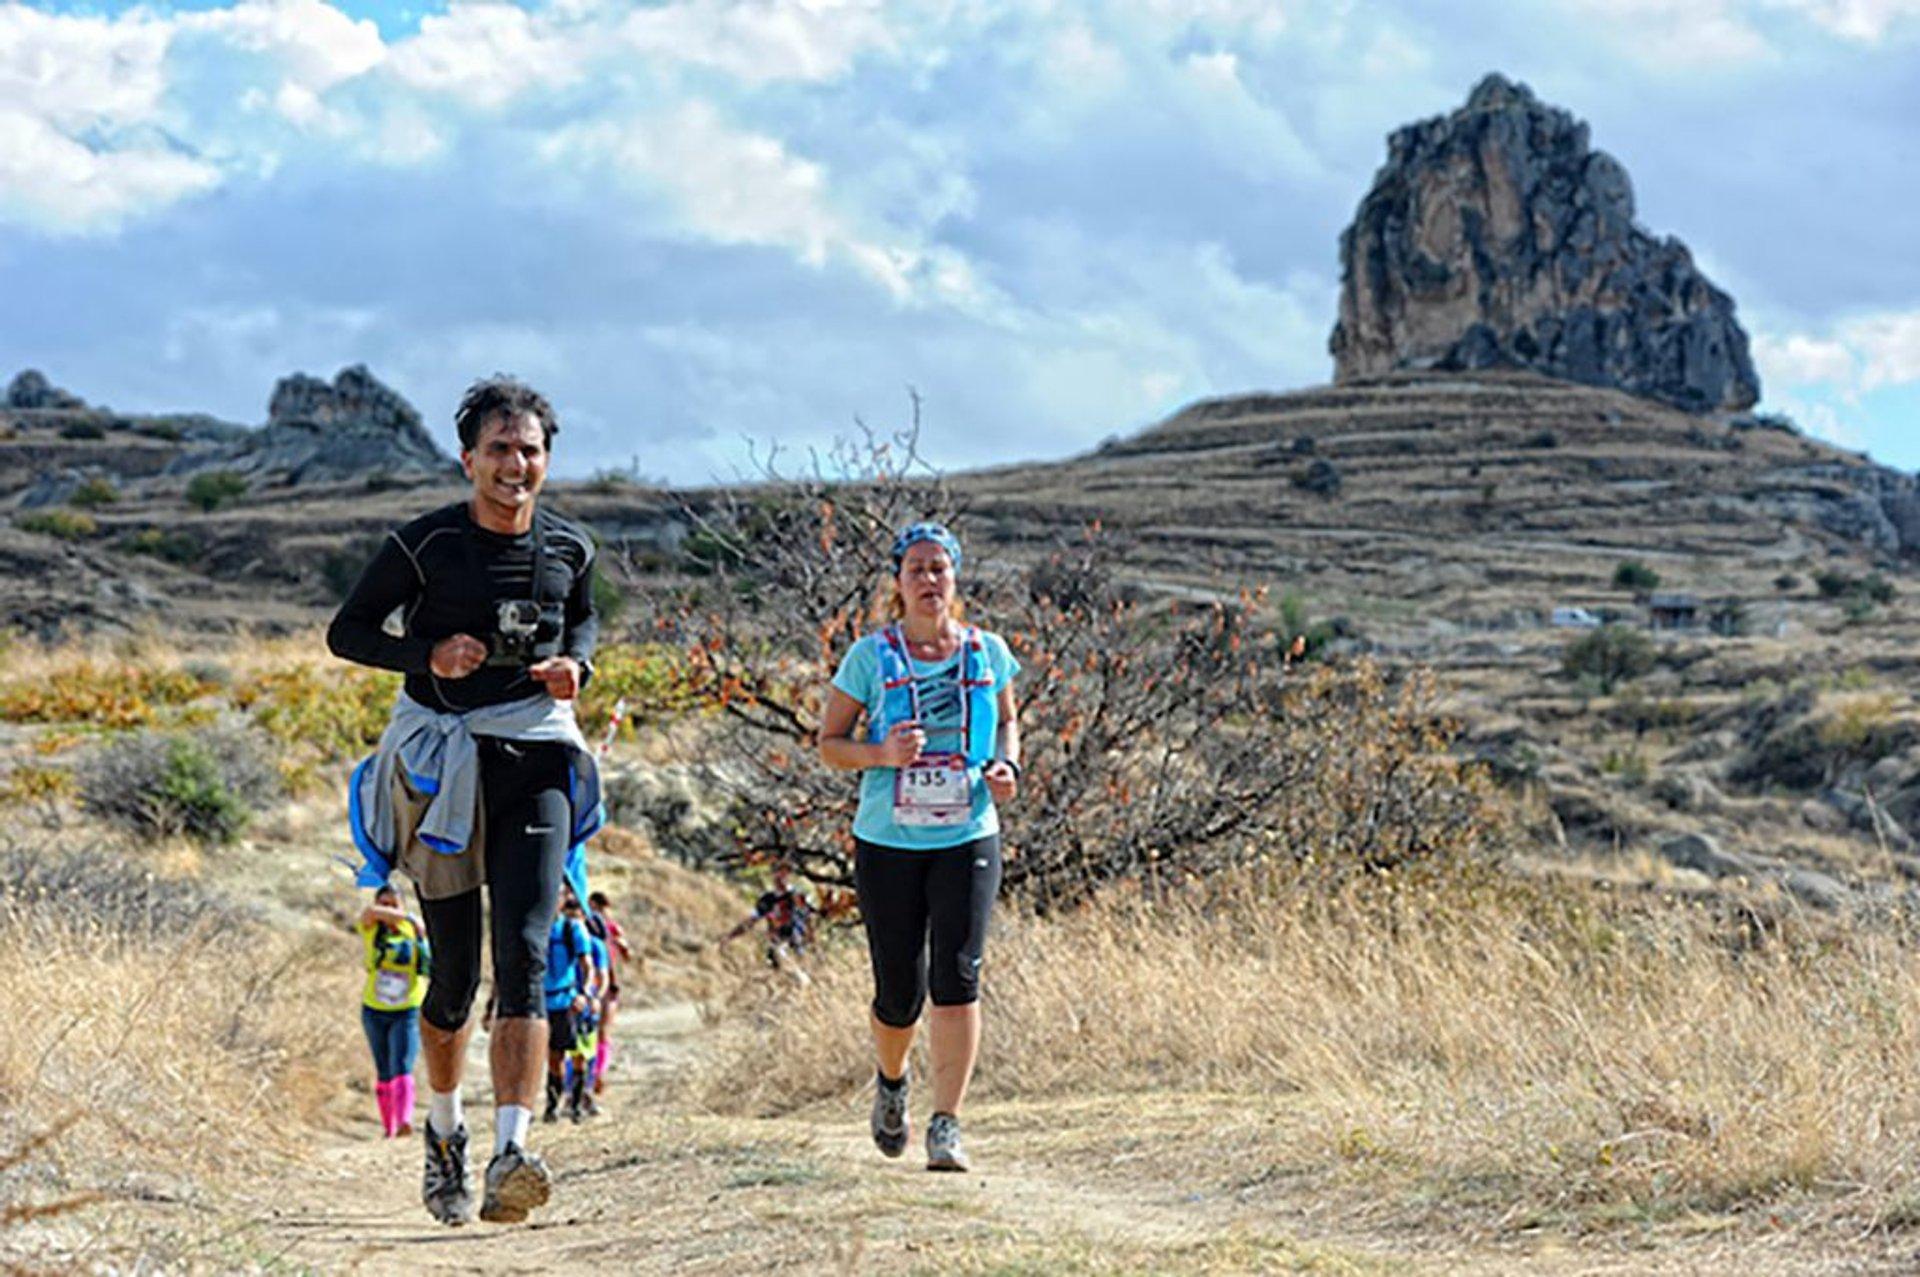 Cappadocia Ultra Trail in Cappadocia 2019 - Best Time